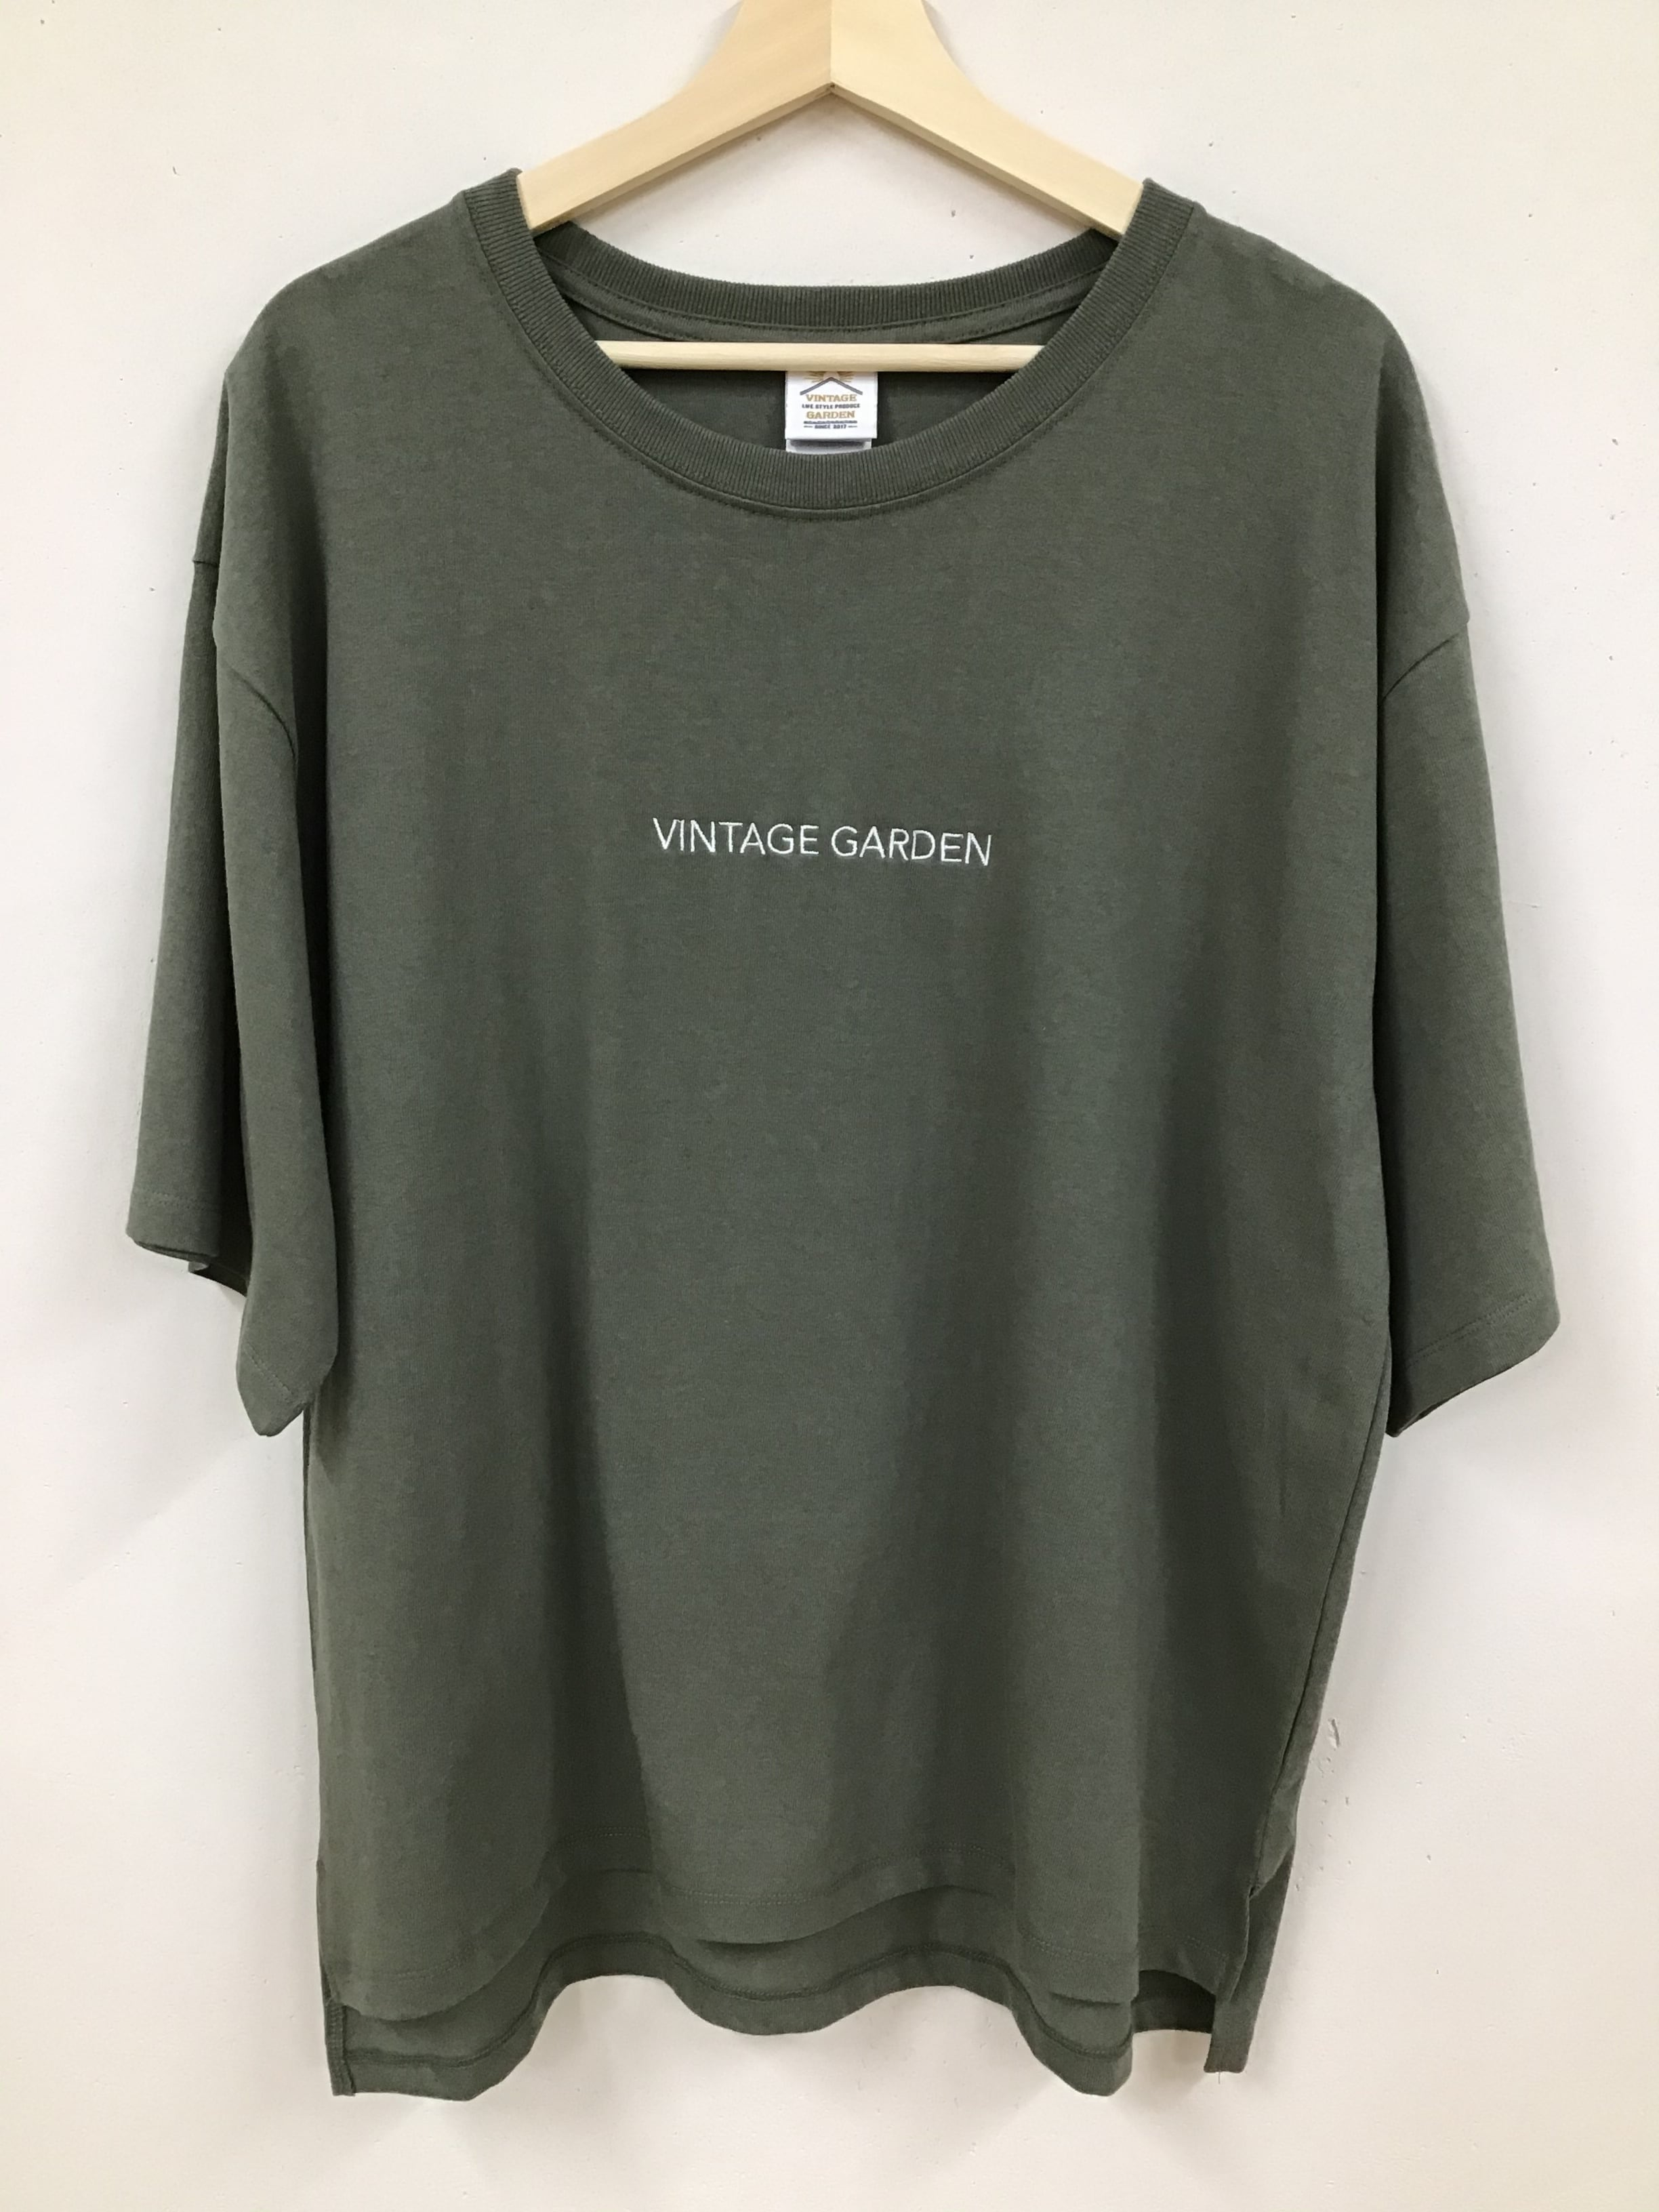 VINTAGE GARDEN シンプルビッグTシャツ(刺繍)